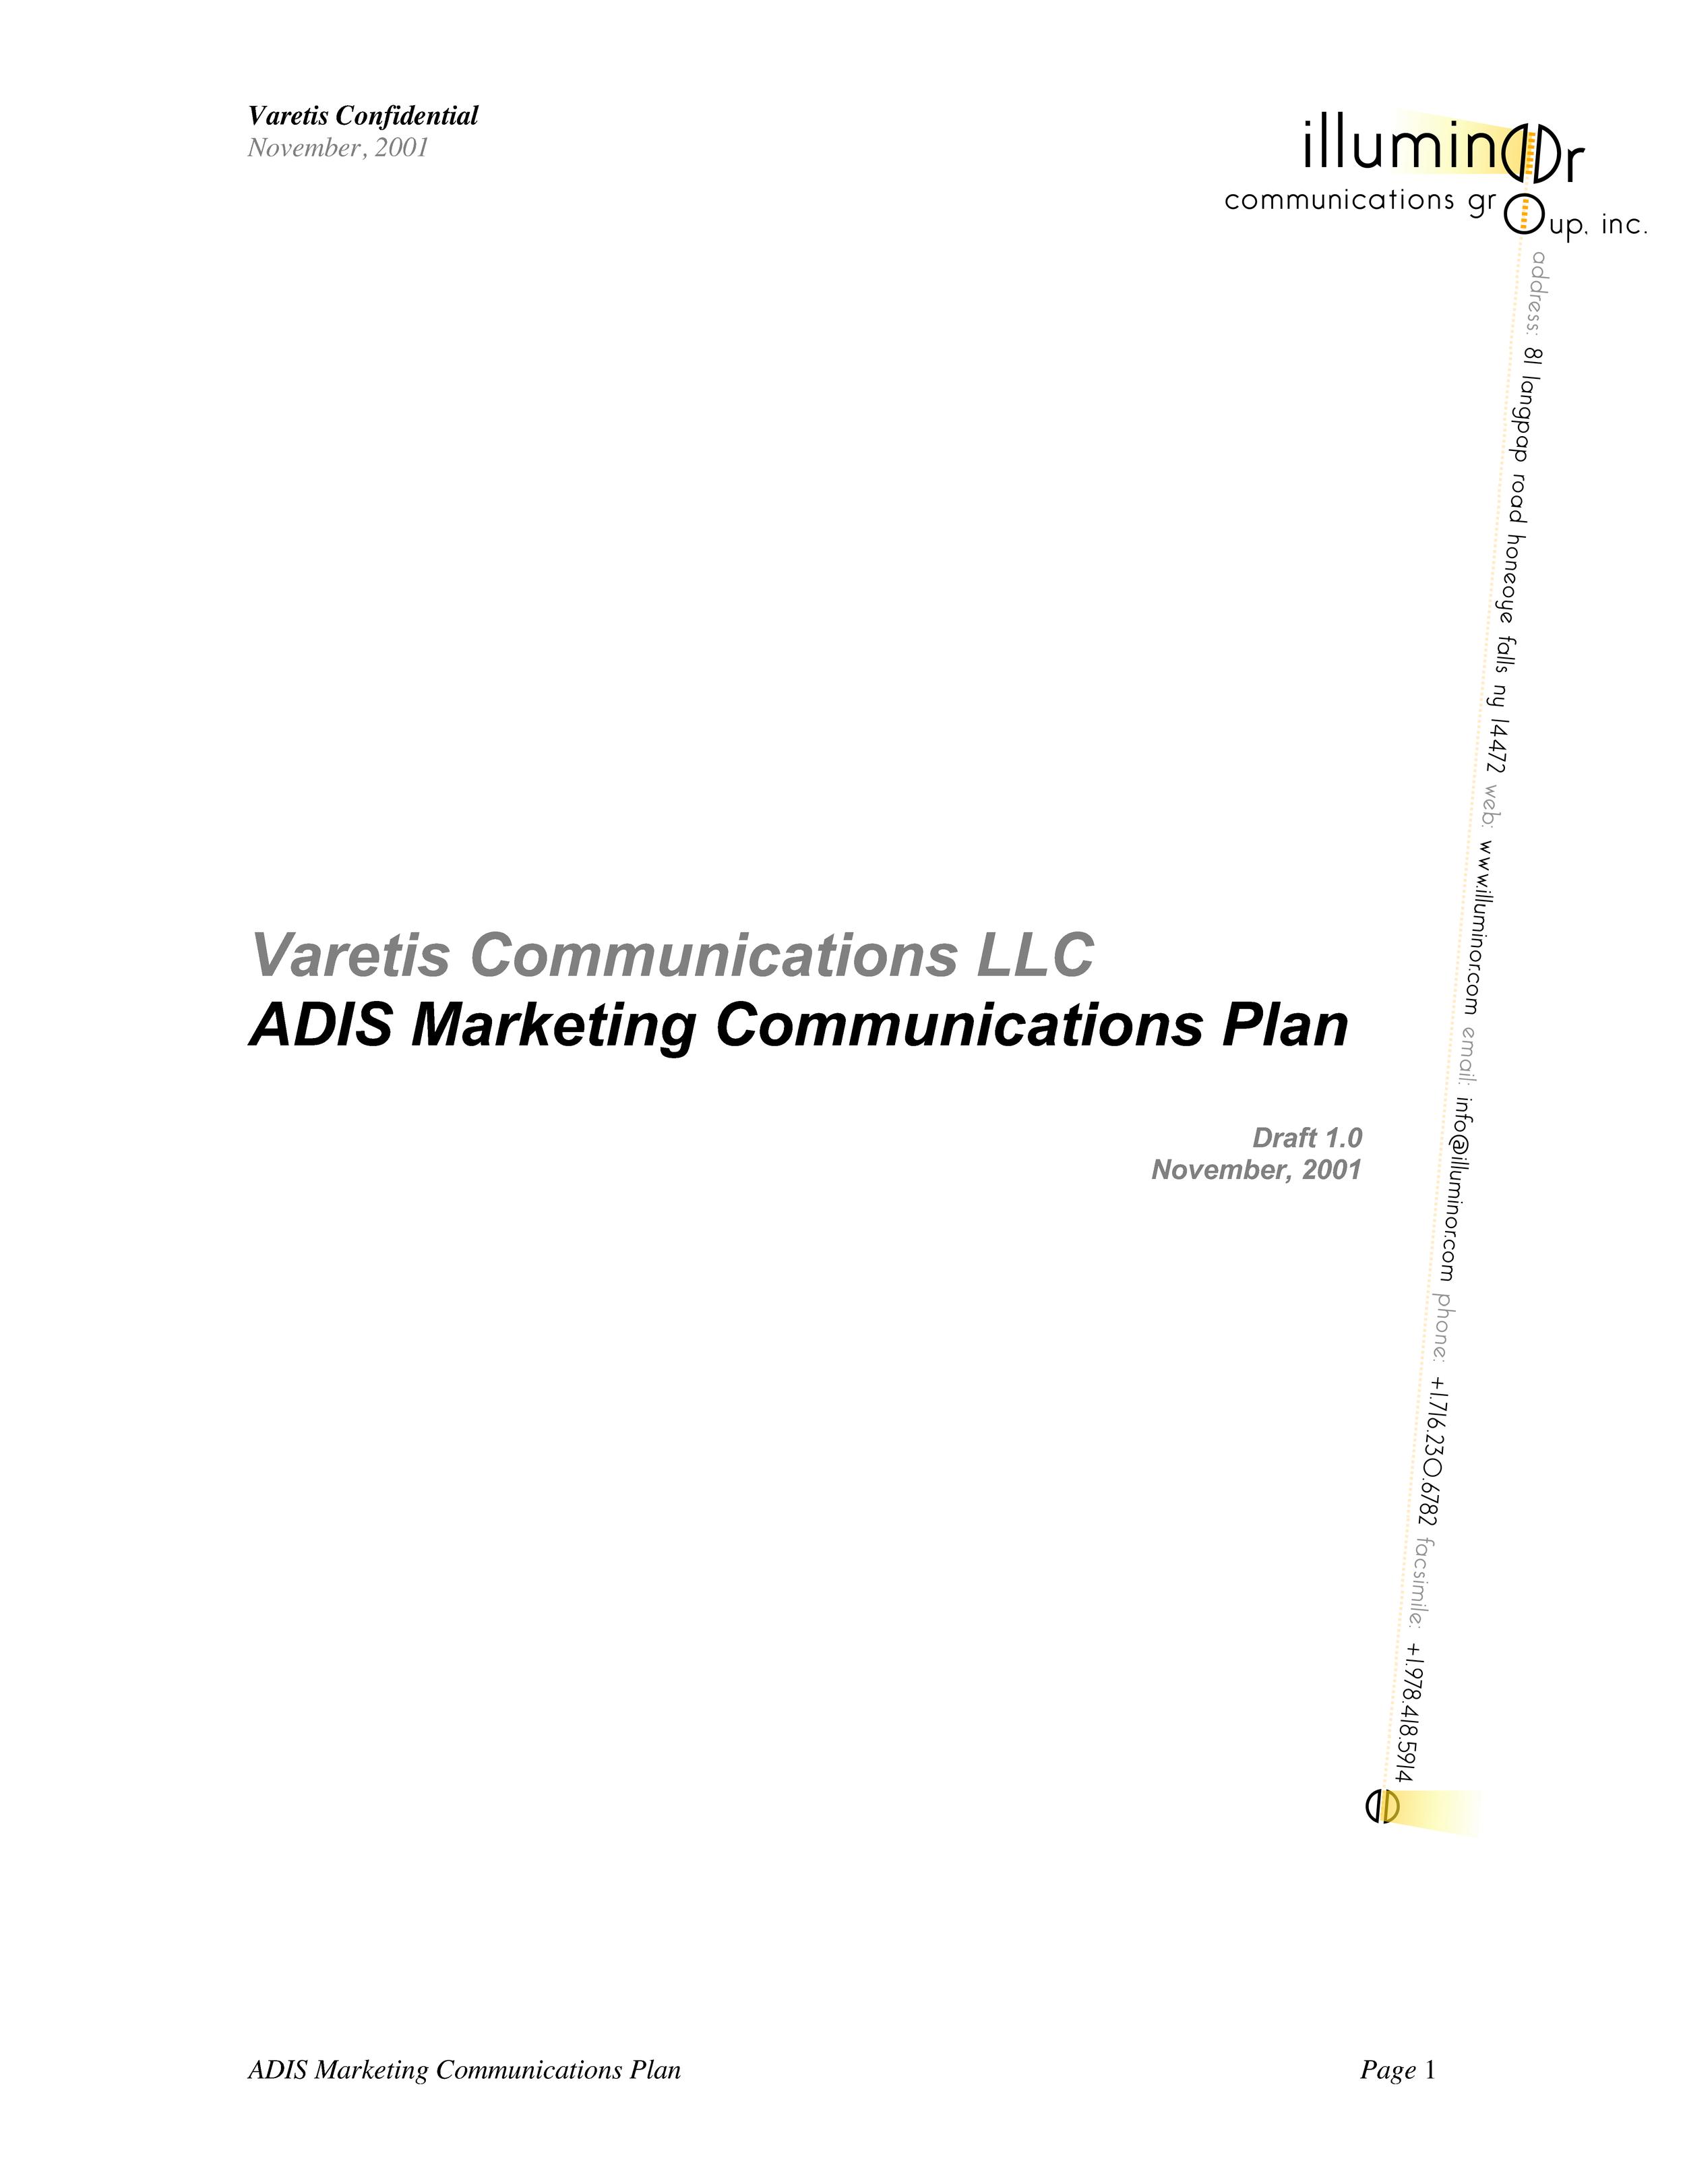 ADIS Marcomm Plan_Page_01.png